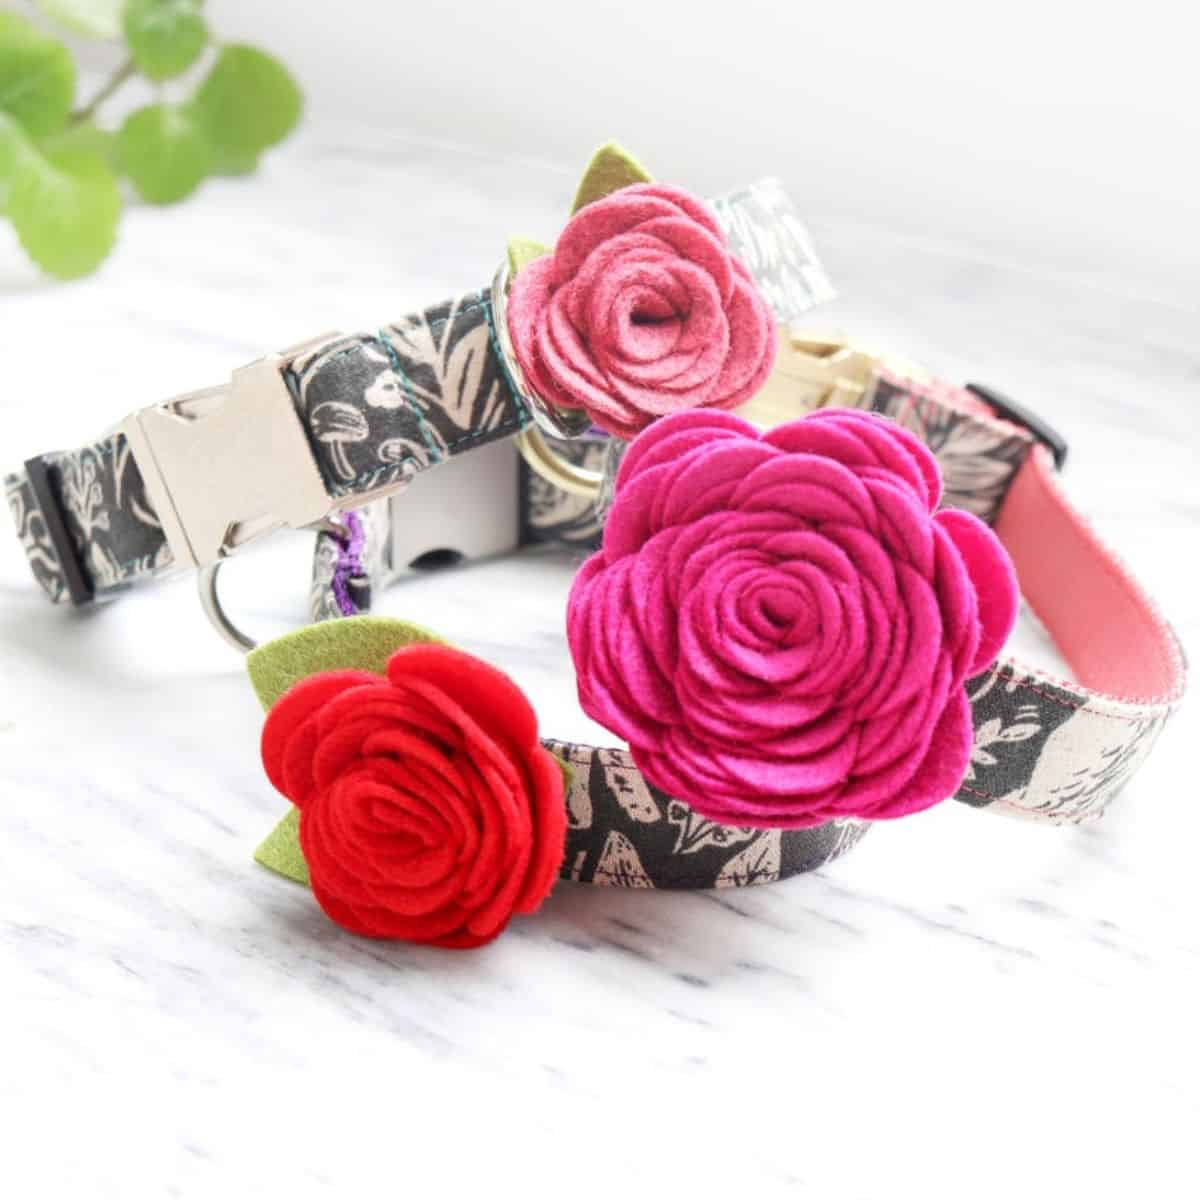 Rose Flower Collar Attachment